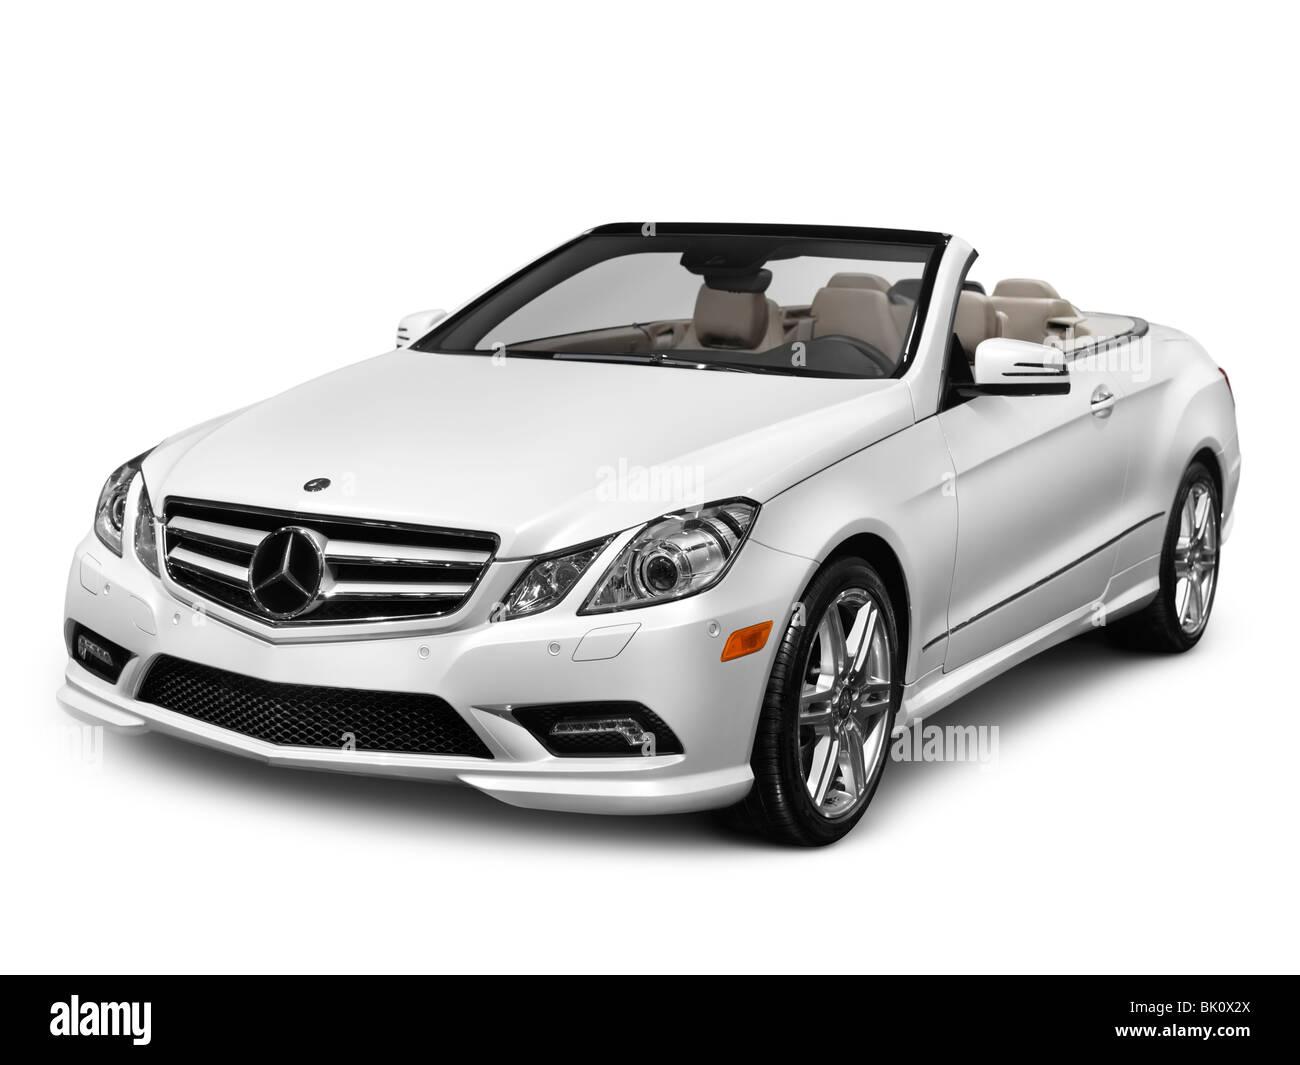 White 2011 Mercedes-Benz E-Class Cabriolet Luxury Car